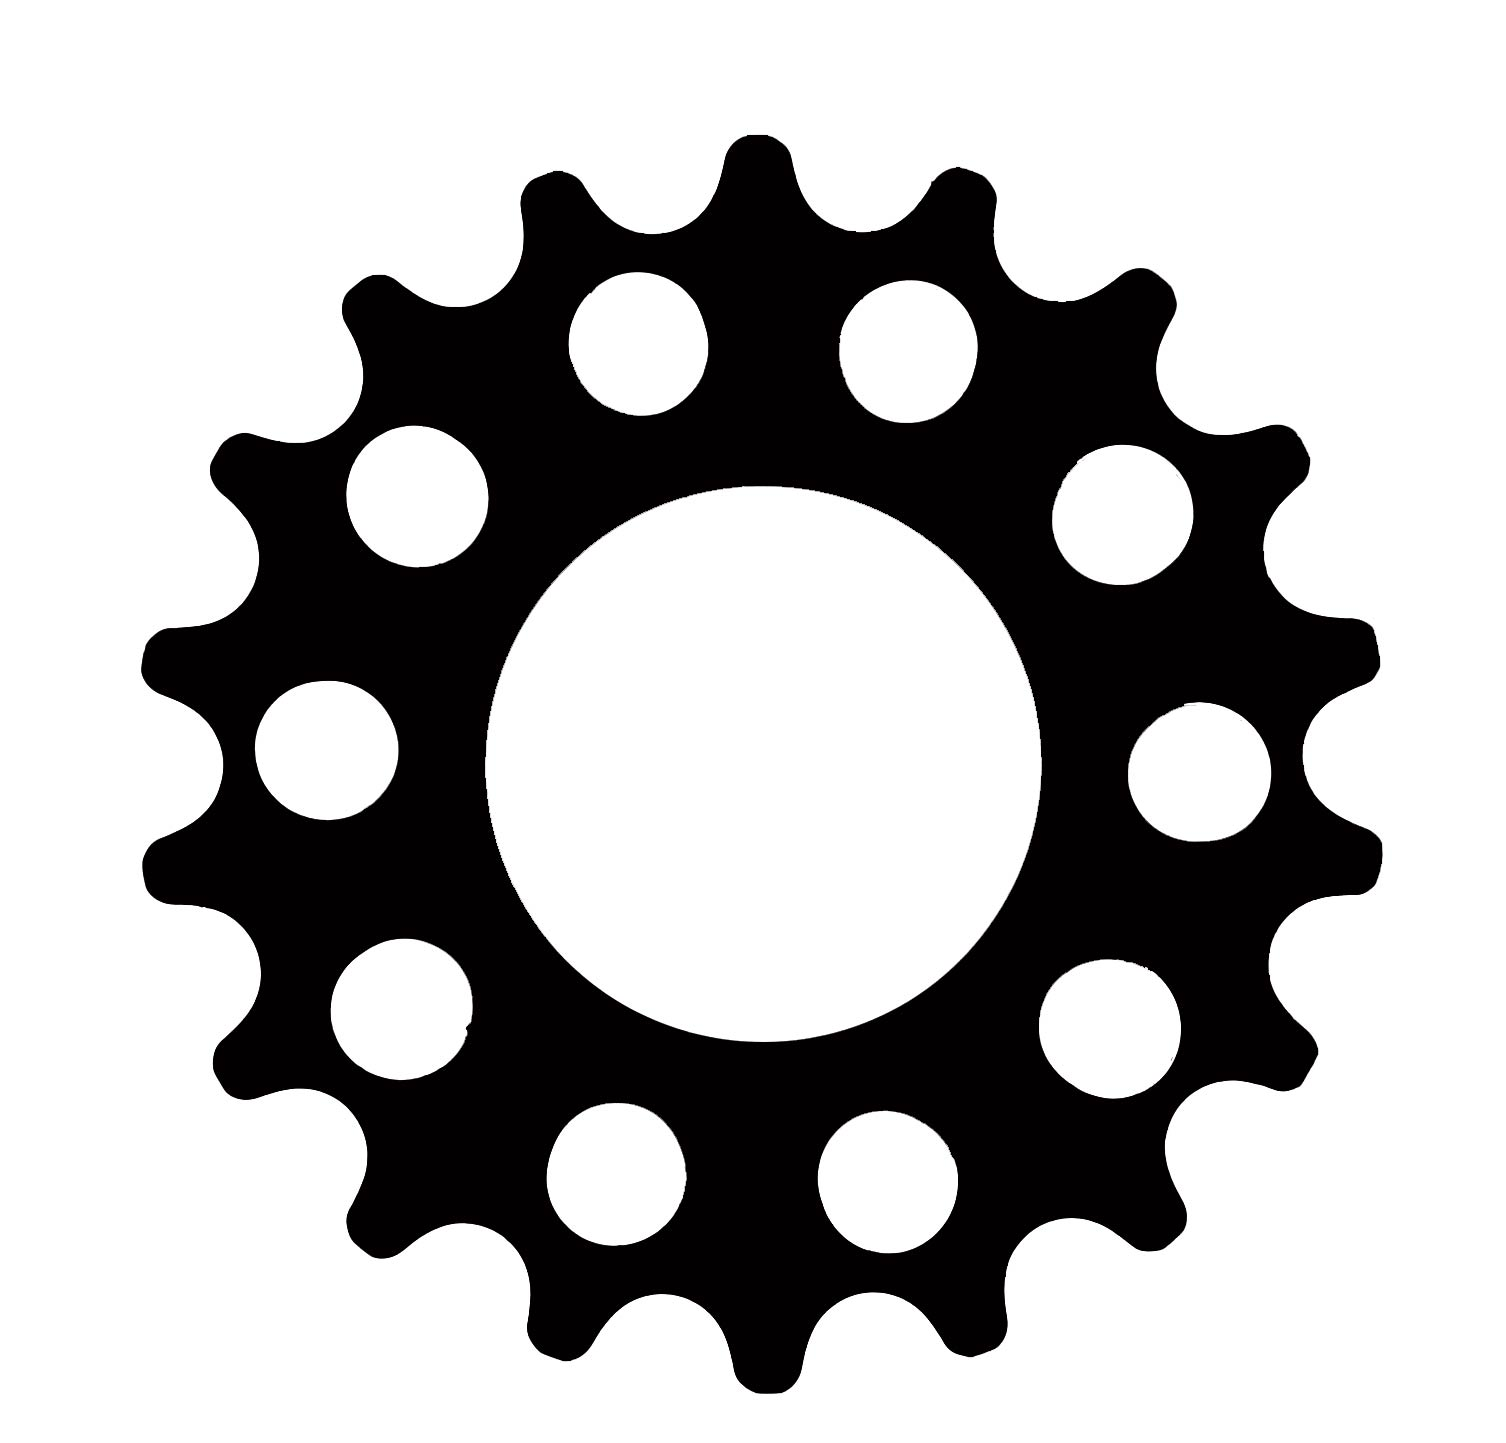 Black Sprocket On White Background Clipart - Free Clip Art Images